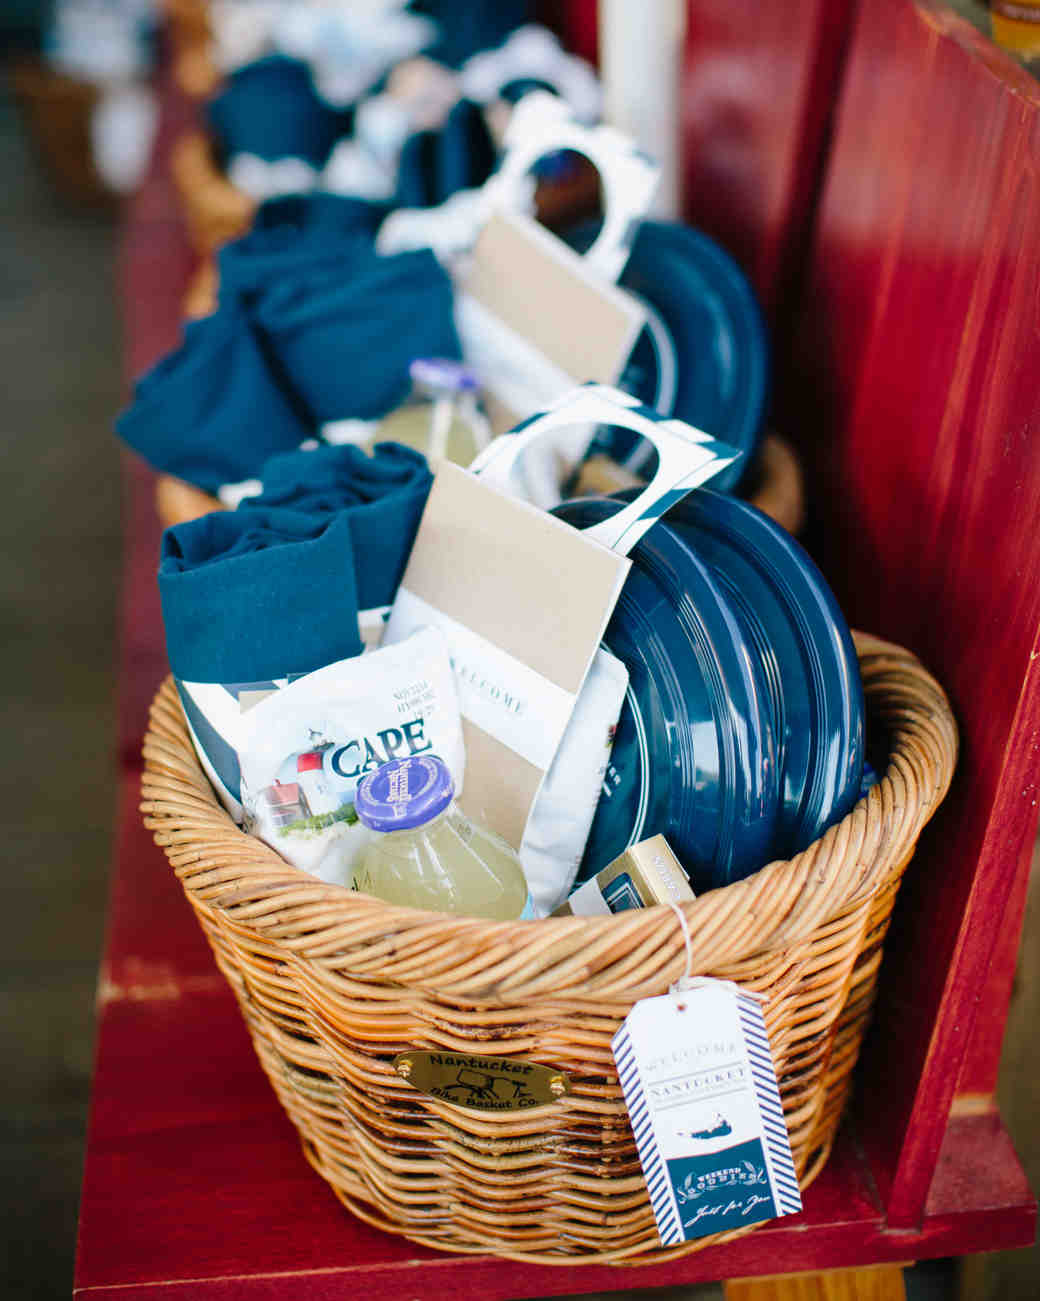 kristen-jonathan-wedding-welcomebasket-0121-s112193-1015.jpg